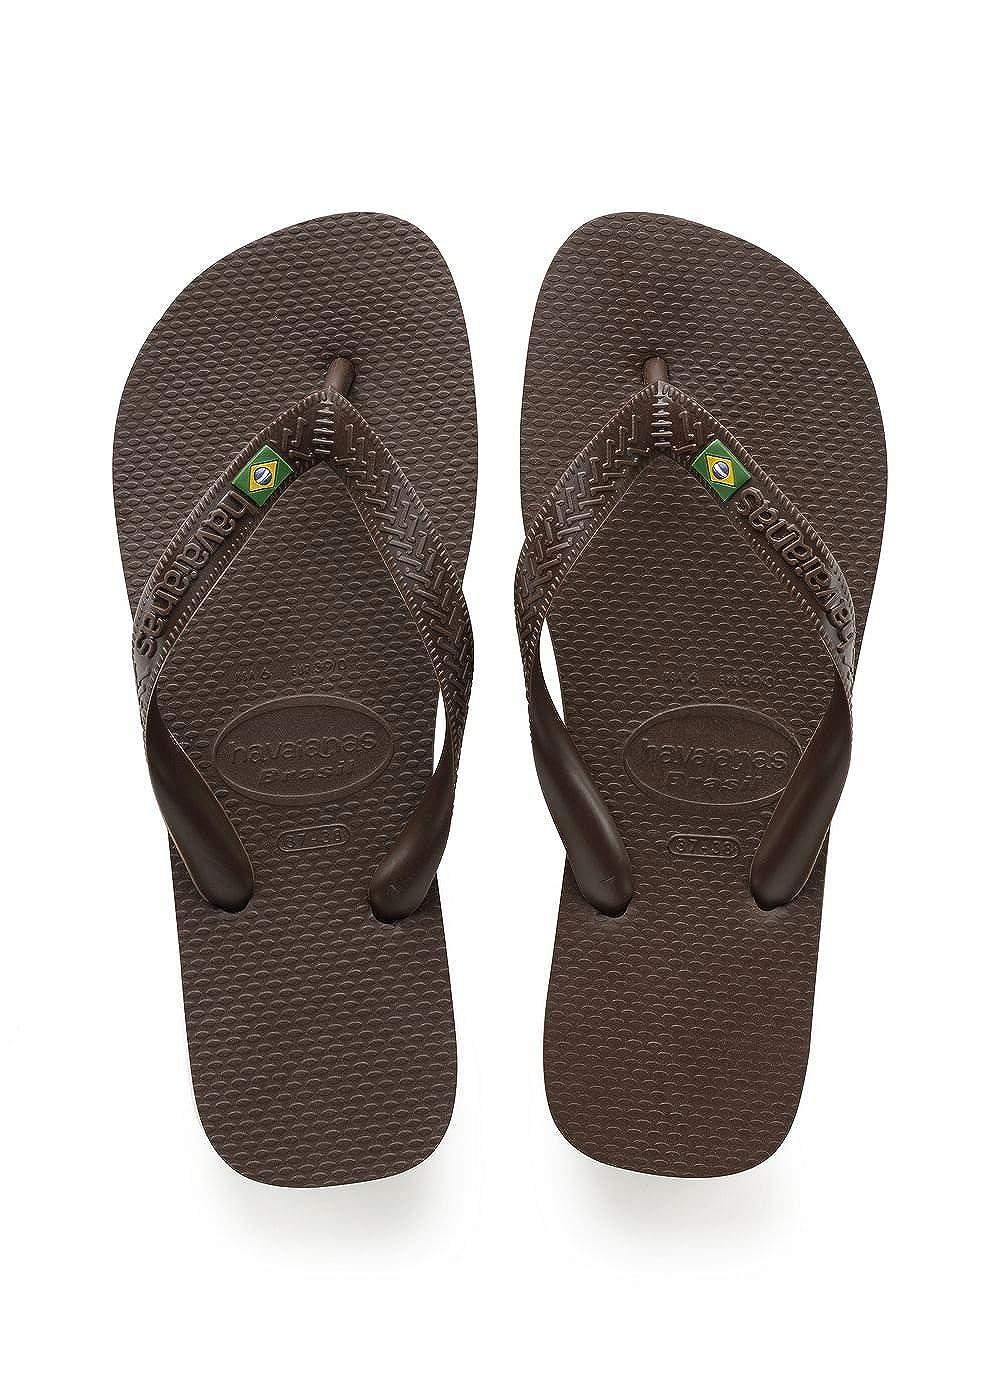 Havaianas Brasil, Chanclas para Unisex Adulto, Marrón (Dark Brown), 35/36 EU (33/34 Brazilian) Soonproject gmbH i.G. 4000032 flip flops flip-flops